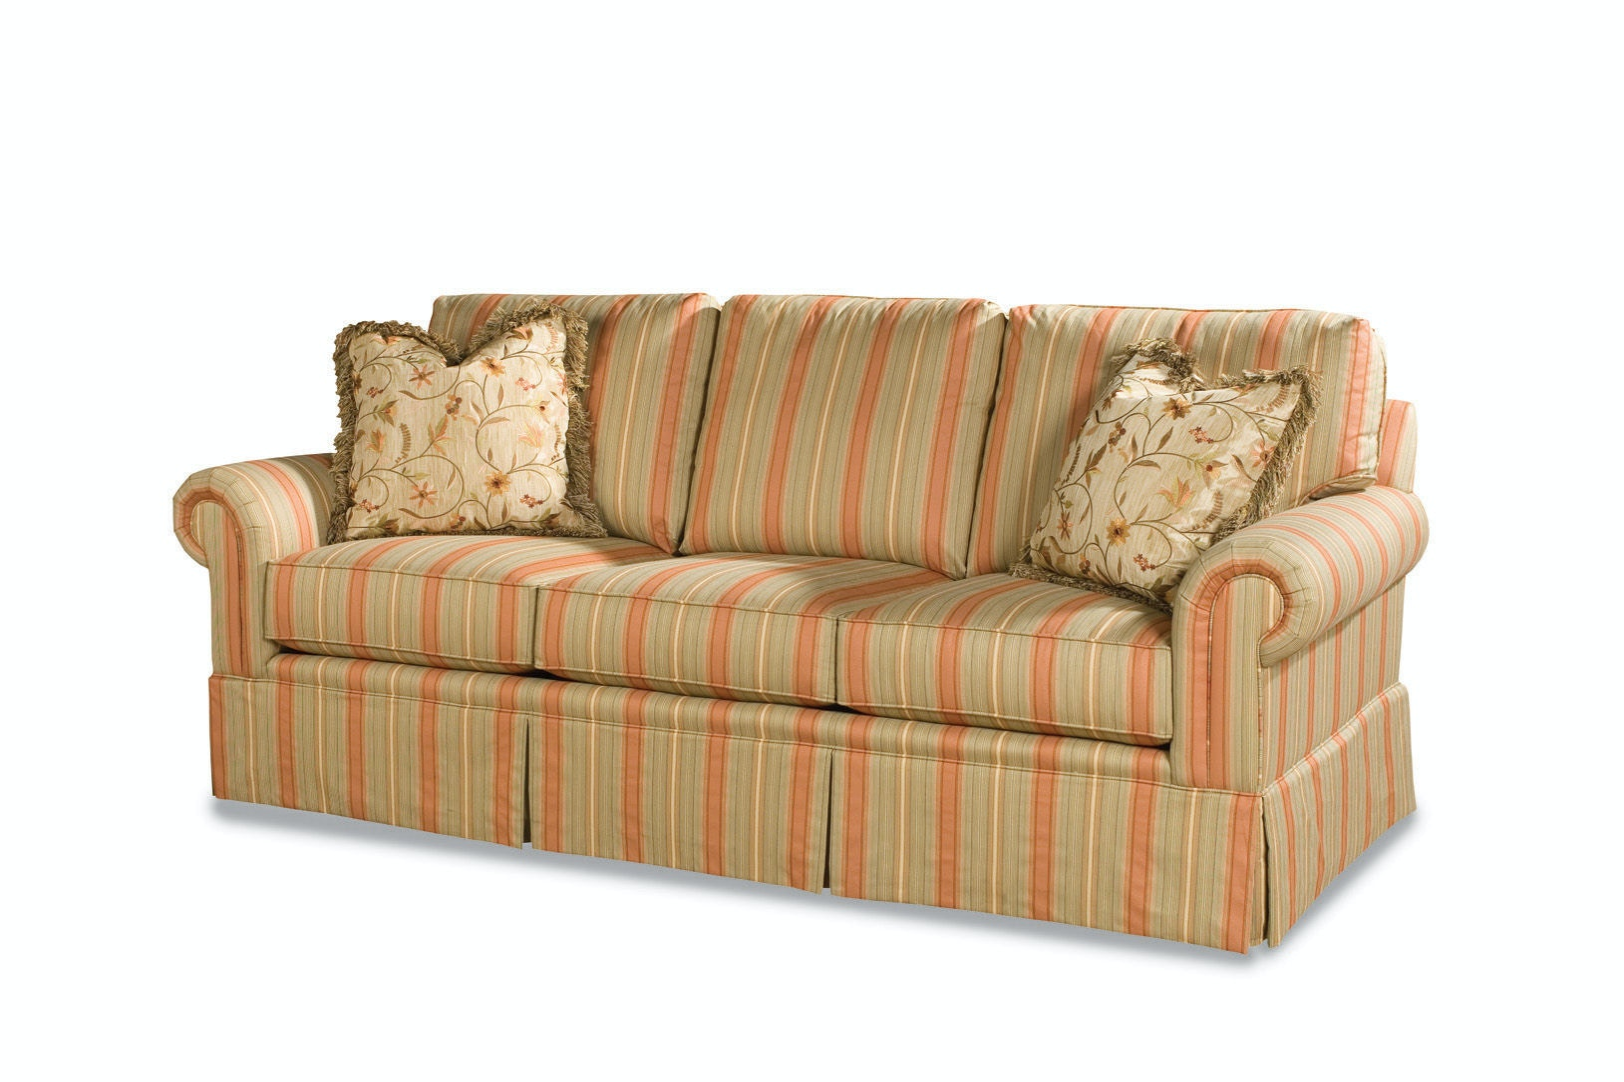 2053 20. Sofa · Carol House Discount Price $1,997.00